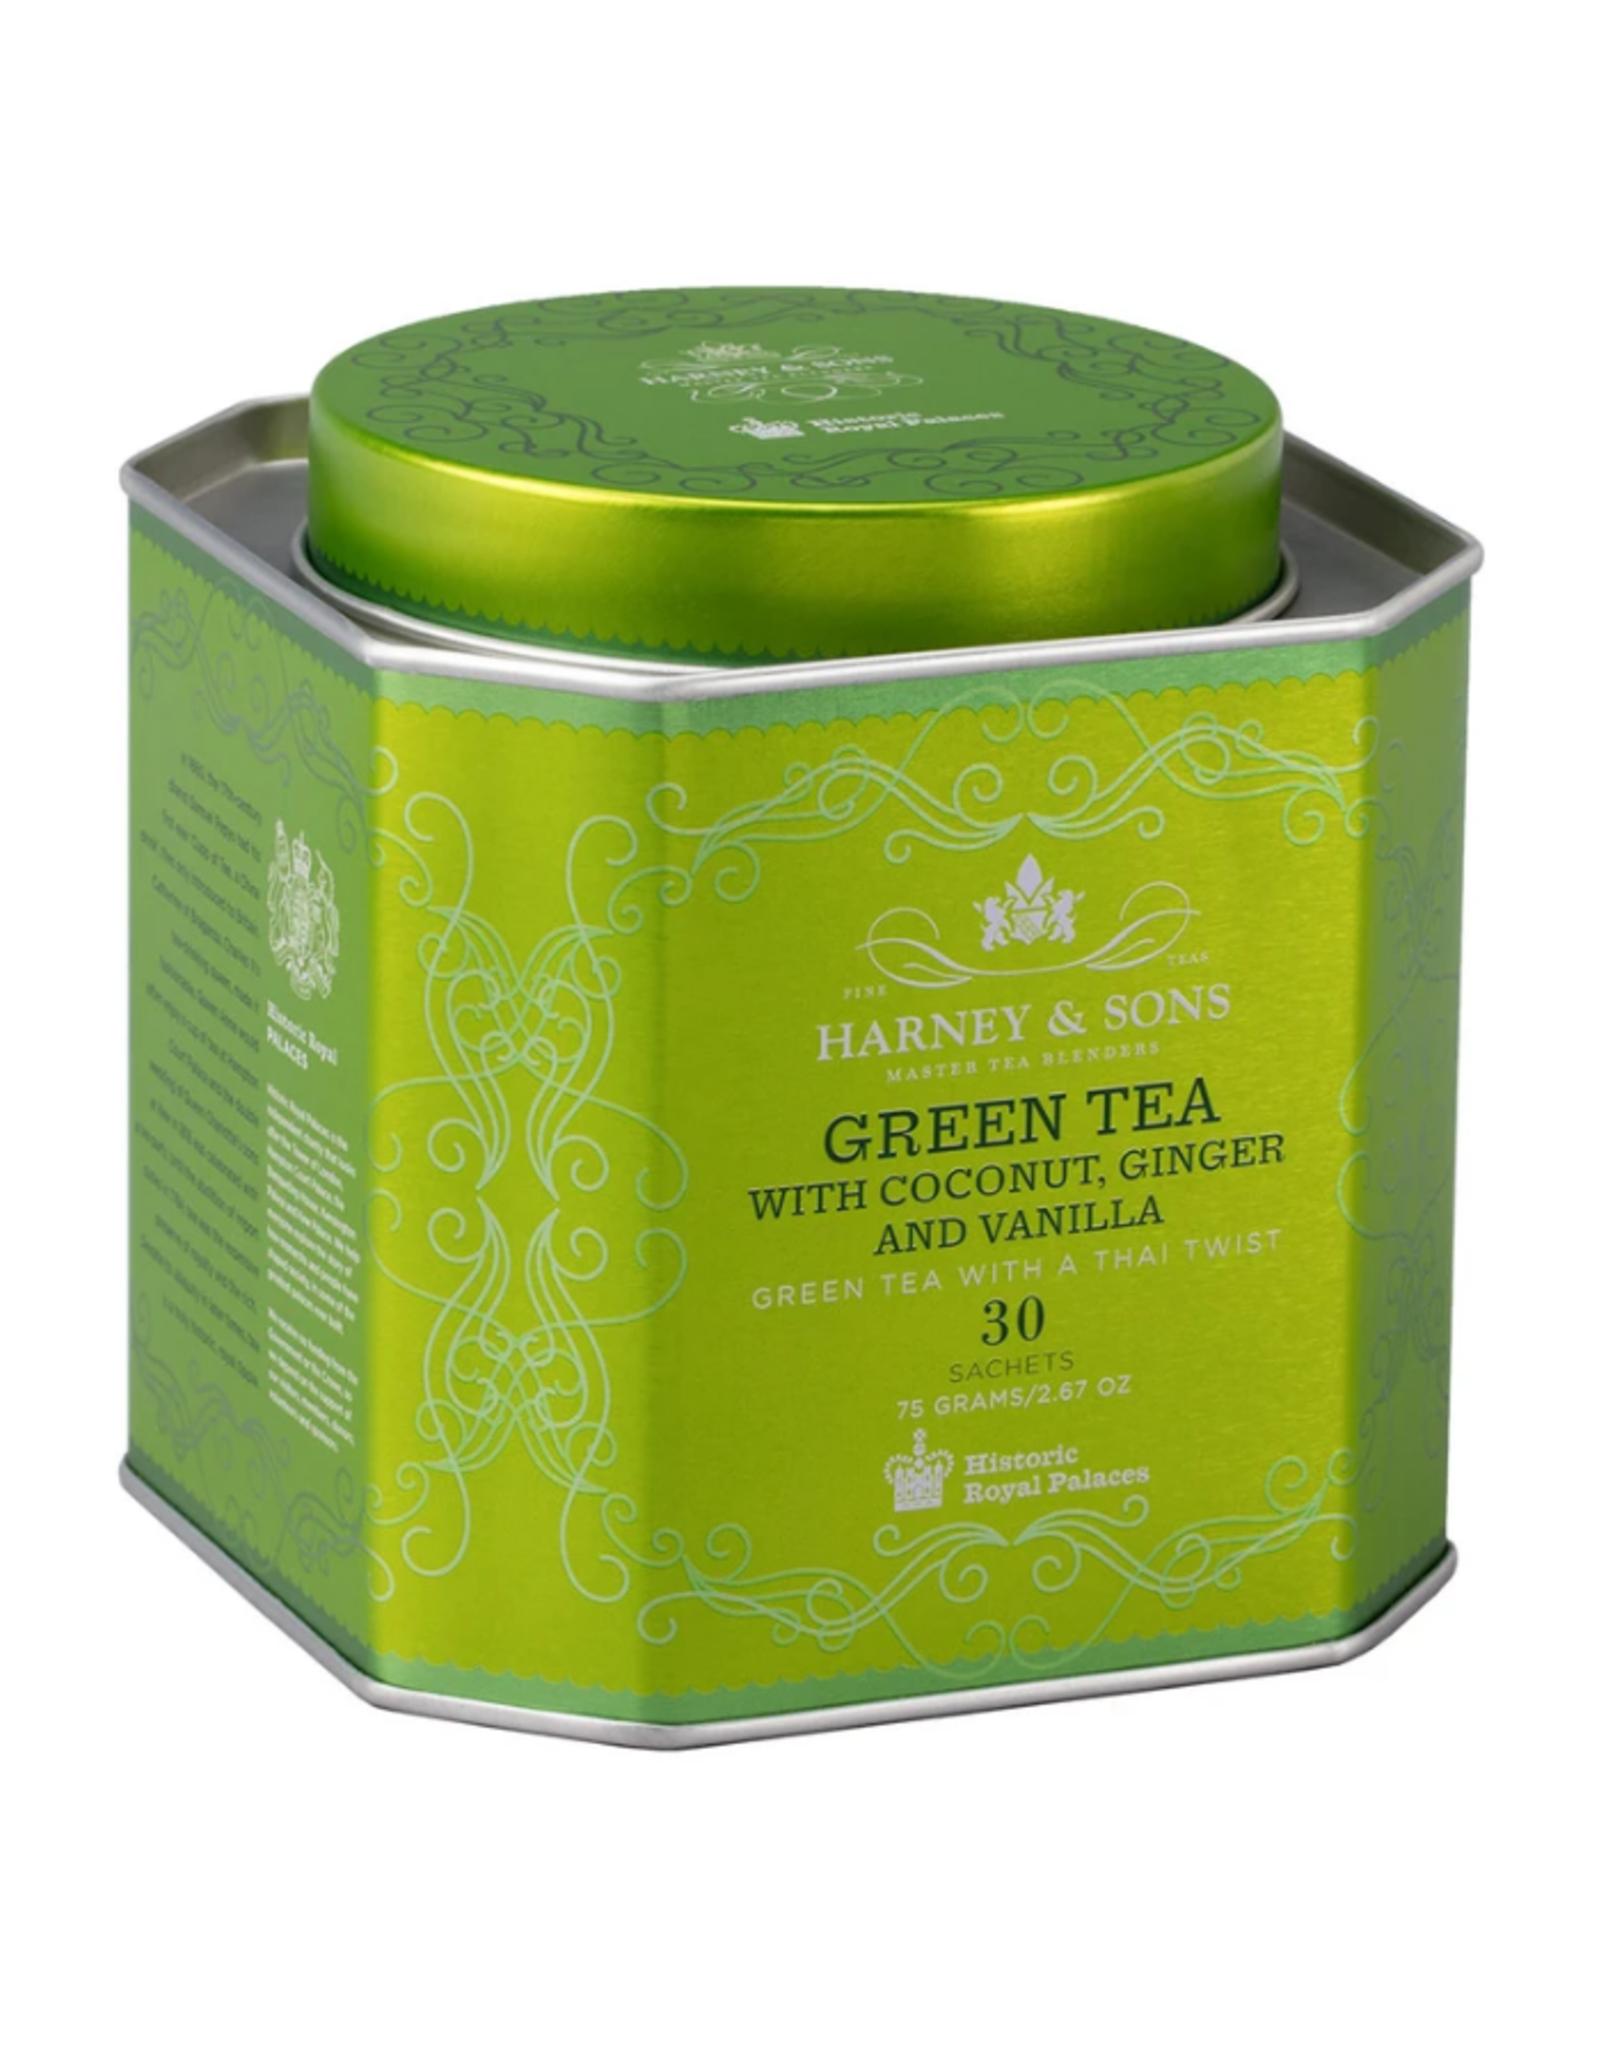 Harney & Sons Green Tea w/ Coconut - HRP Tin, 30 sachets